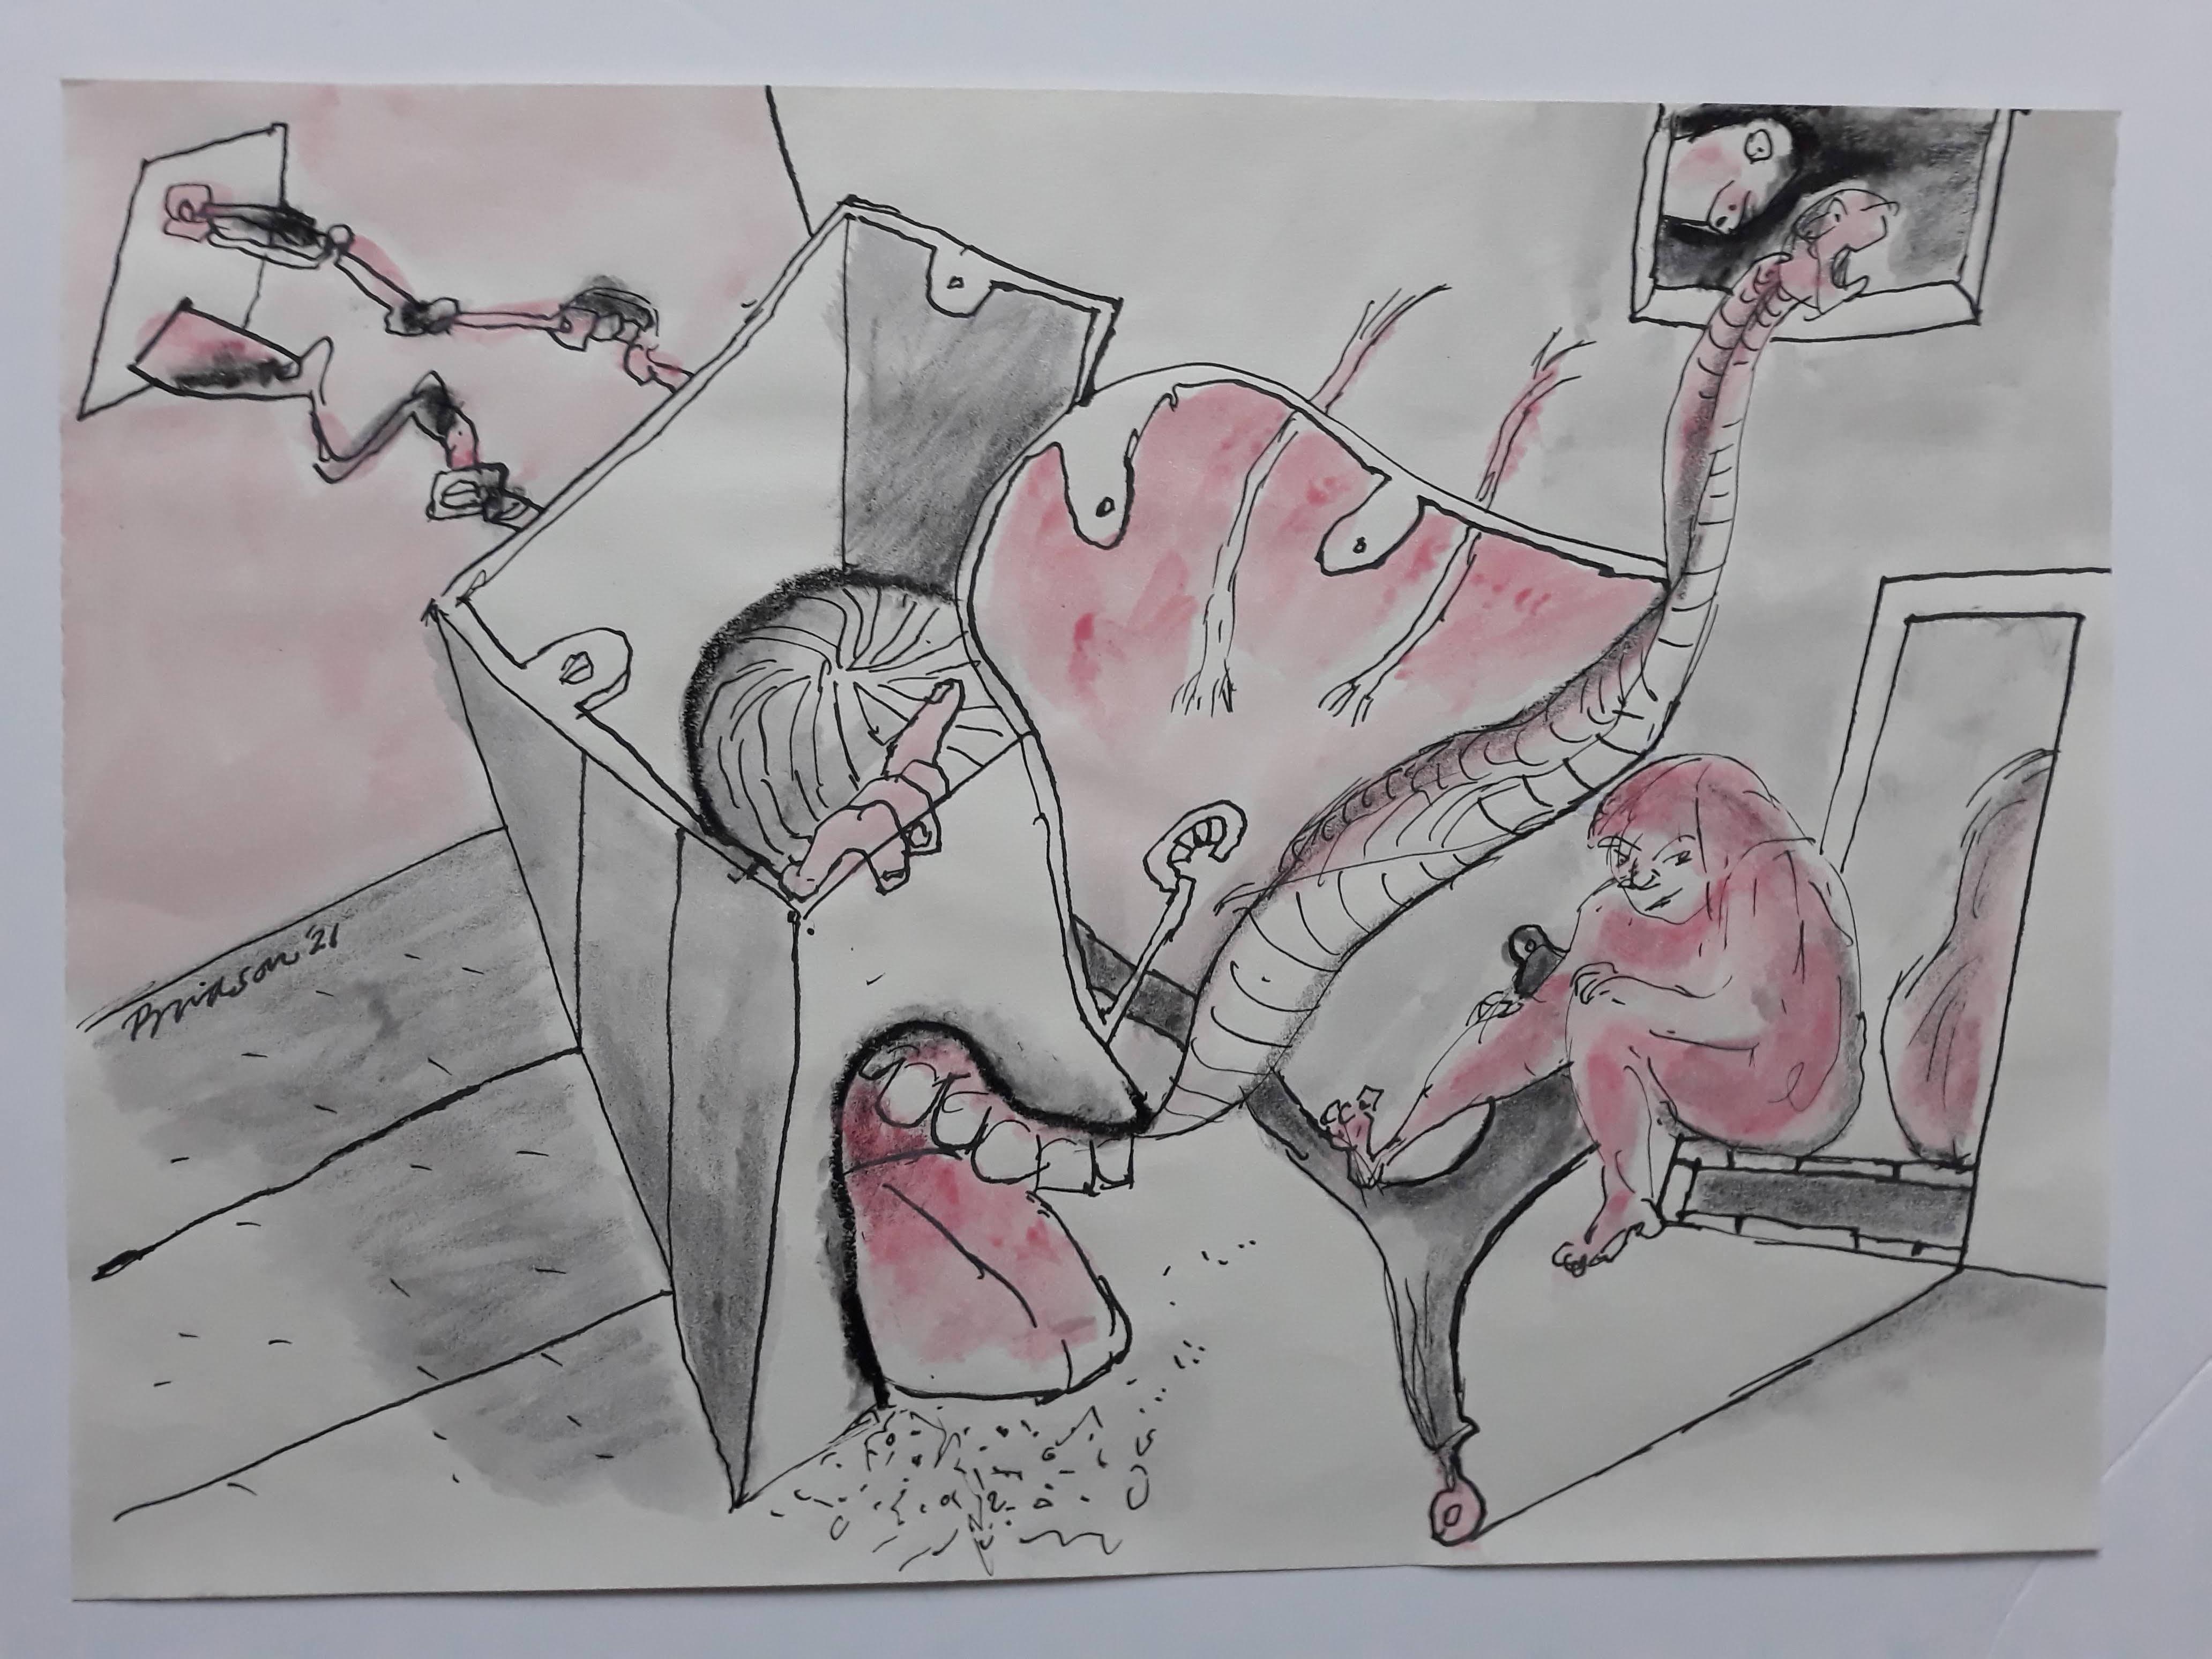 'Interior with Teeth',  2021, 30 cm x 41 cm